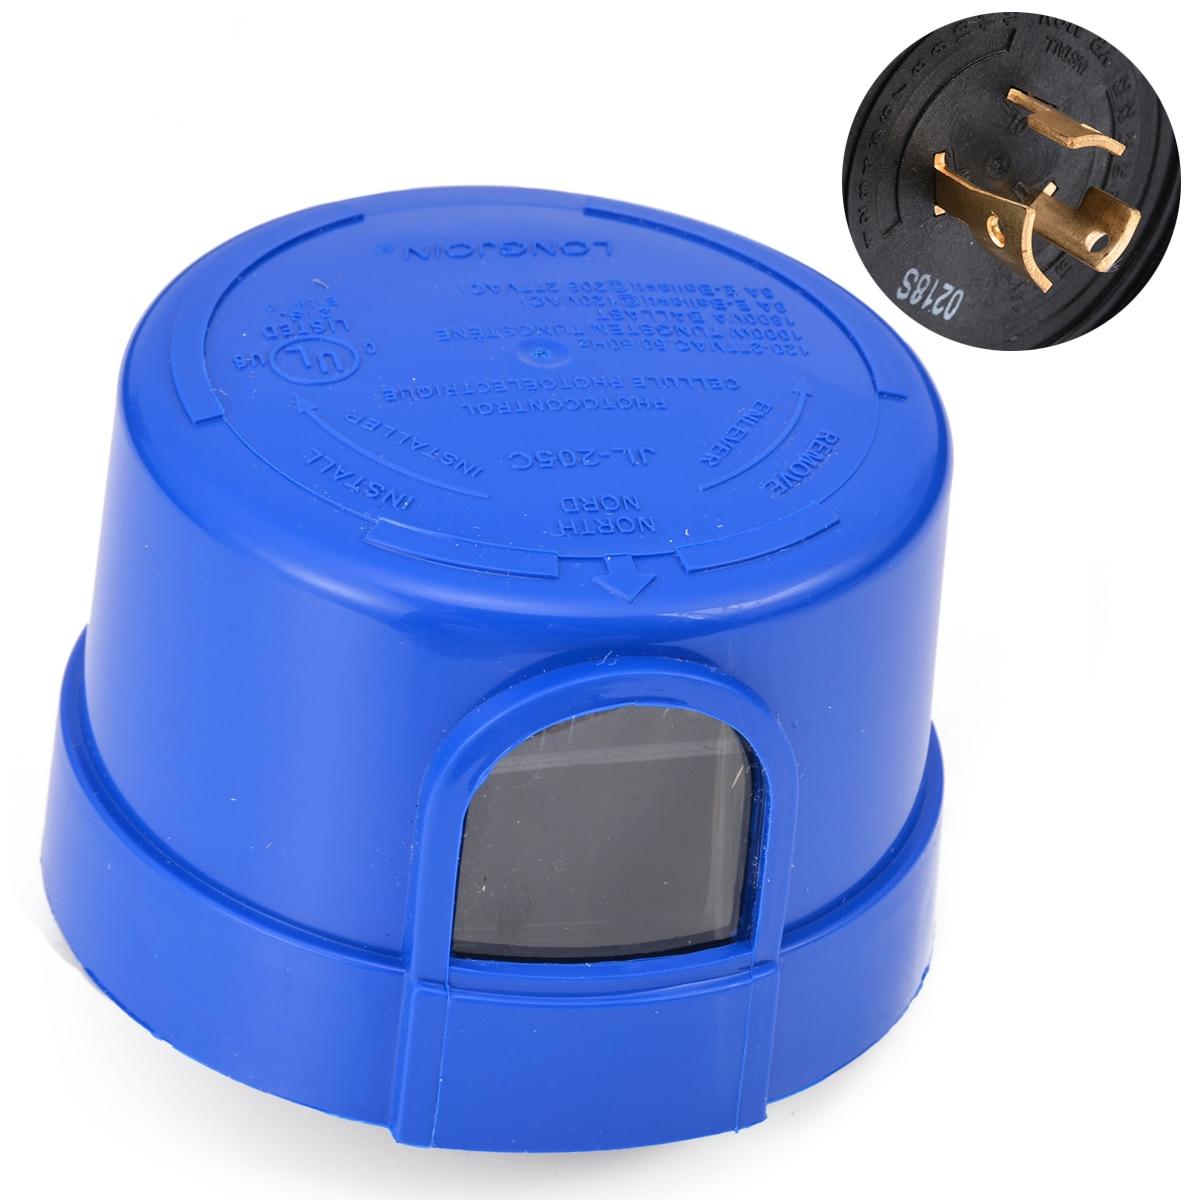 1pc Automatic LED Dusk To Dawn Sensor Outdoor Swivel Cell Light Control Photocell Sensors 120-277 For Street Lighting Mayitr